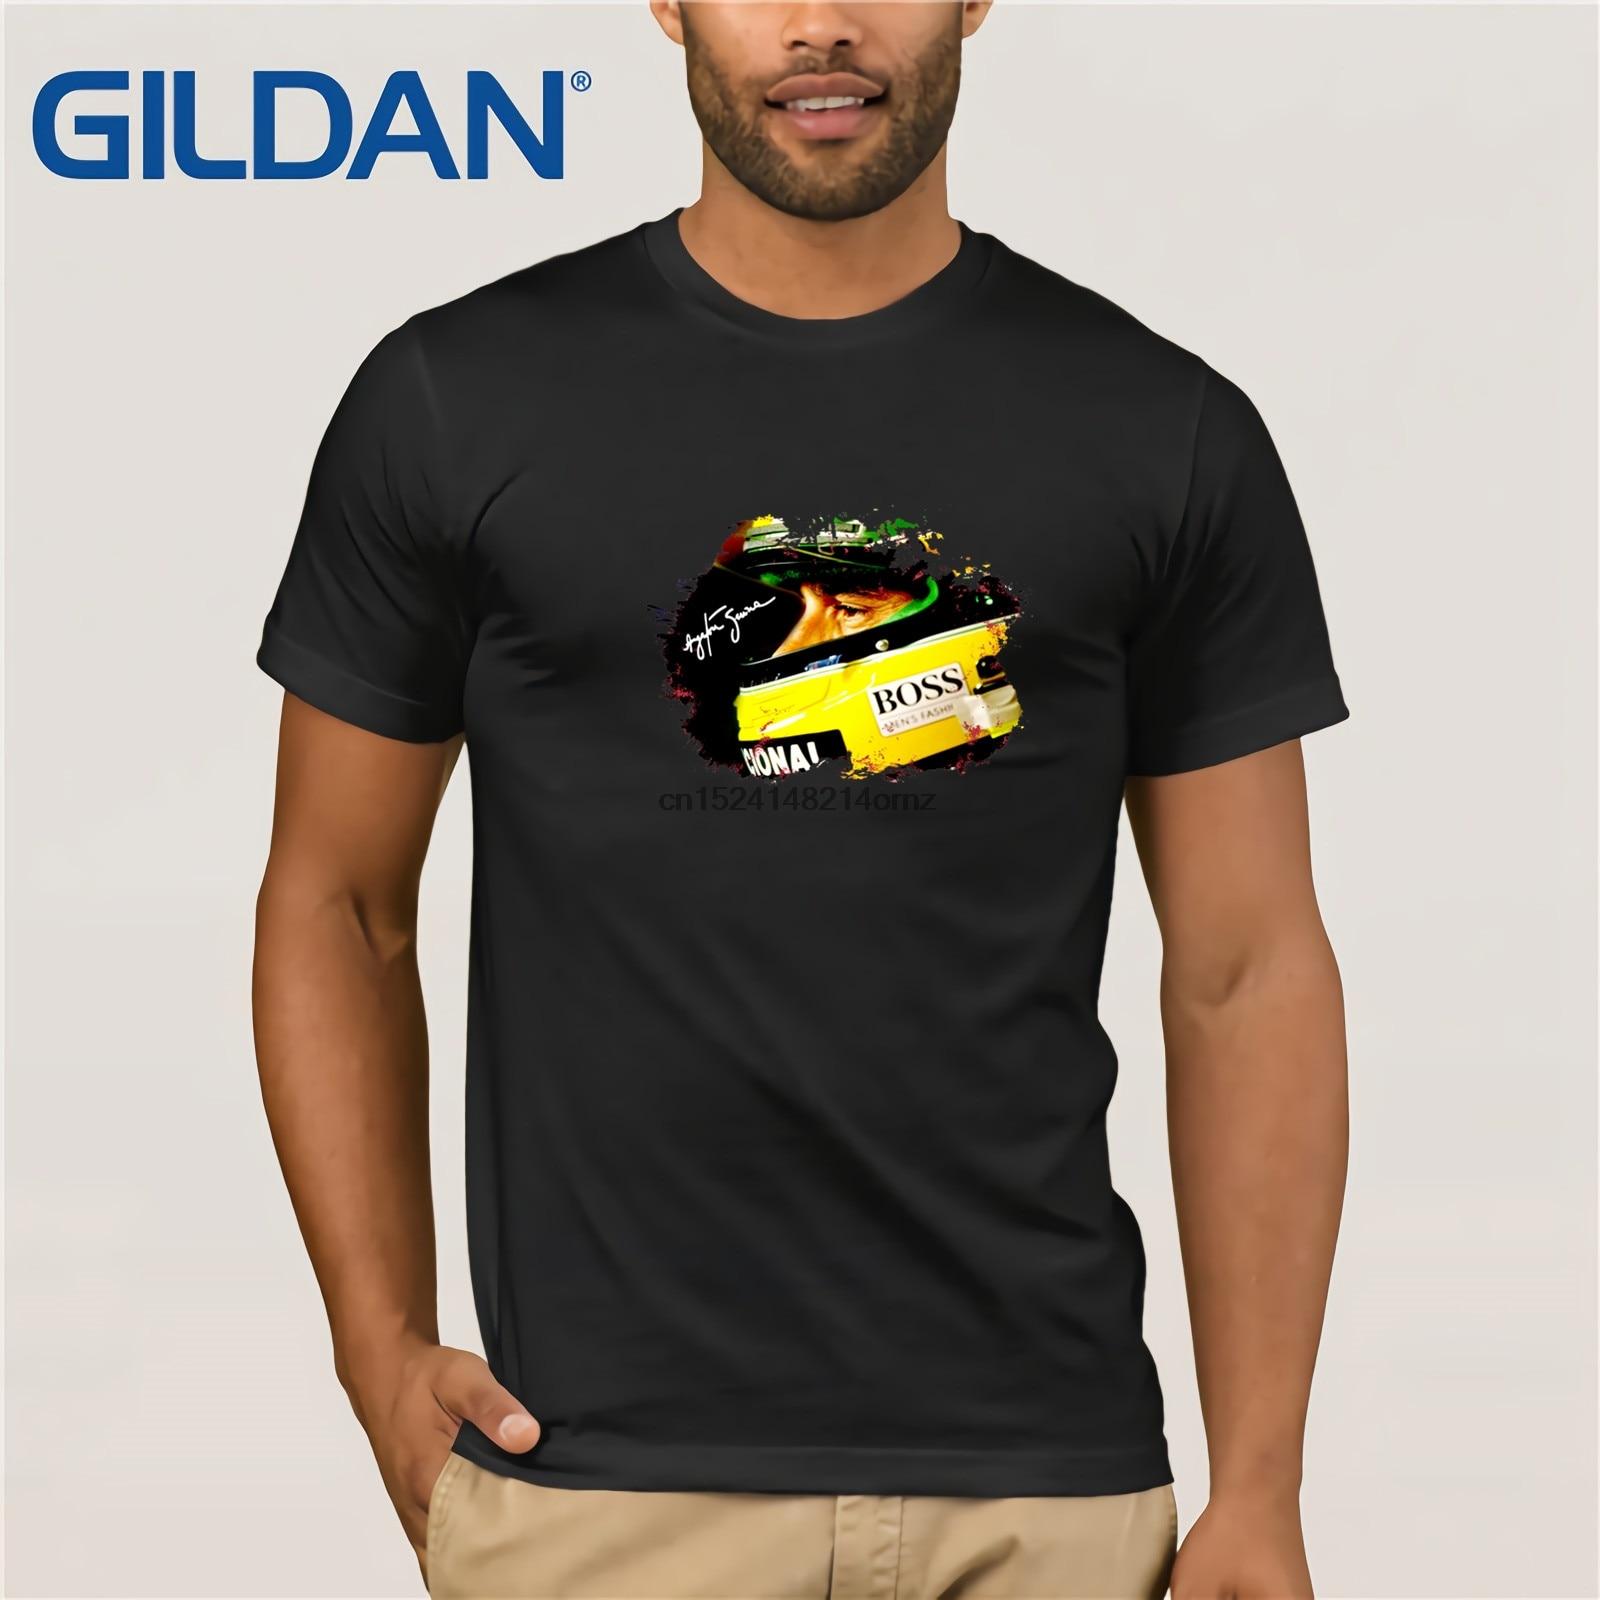 camiseta-de-ayrton-senna-para-hombre-camisa-con-casco-alta-calidad-nueva-moda-2019